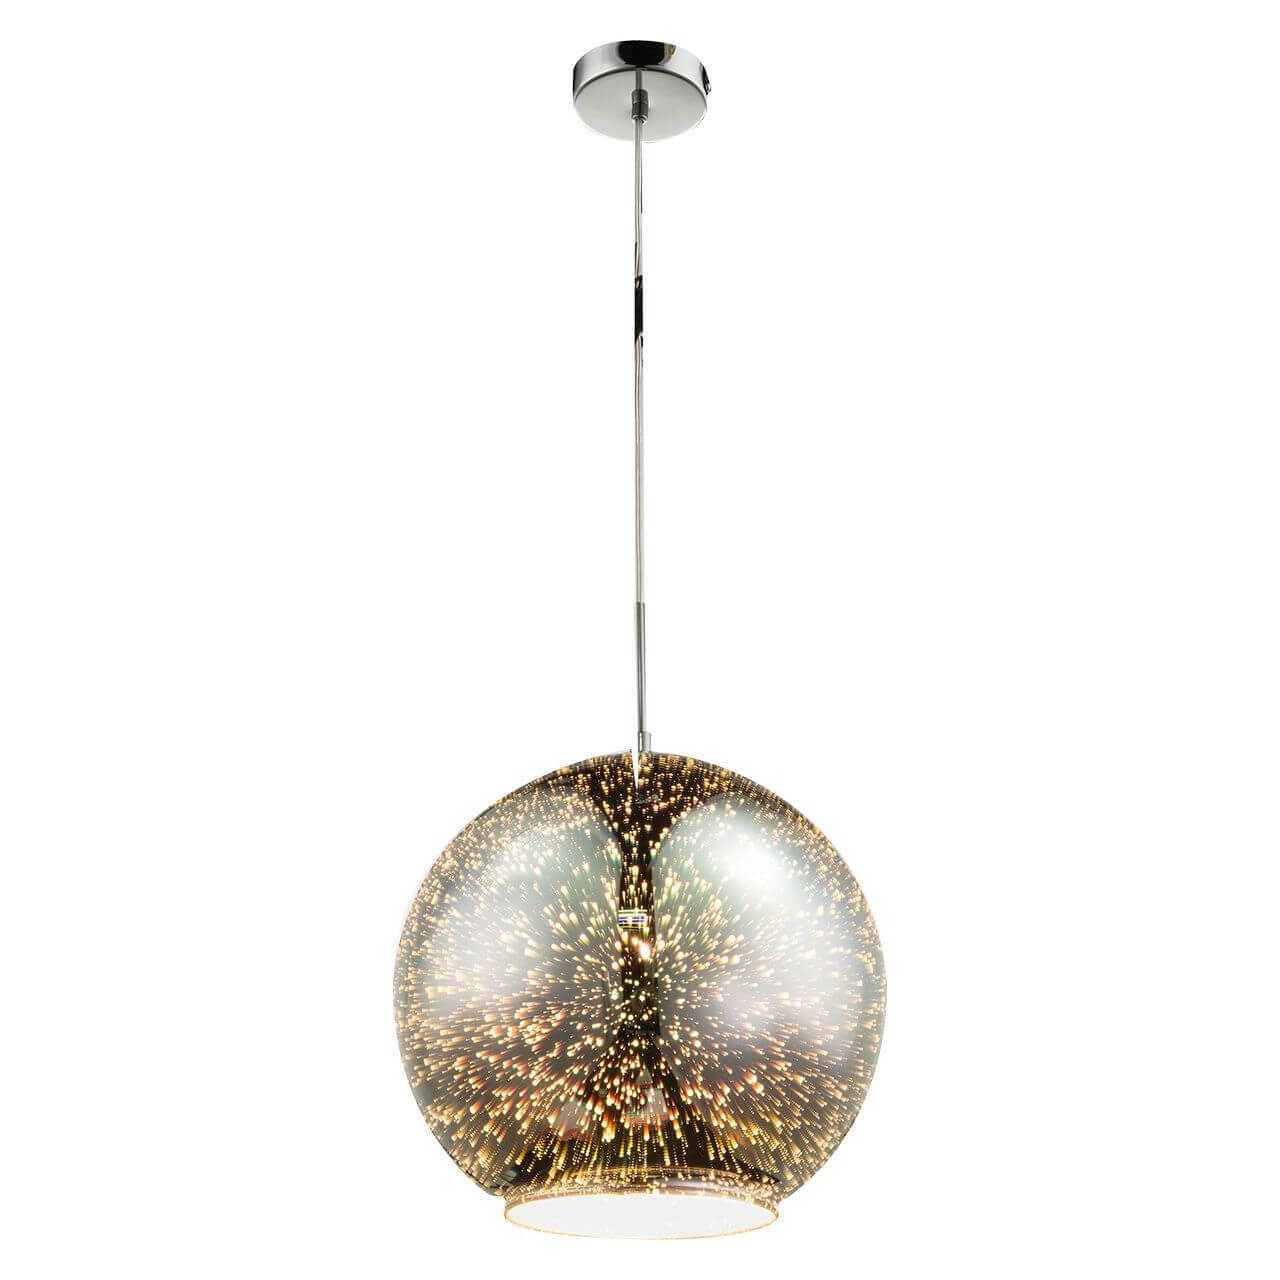 Подвесной светильник Globo Koby 15847 цена и фото